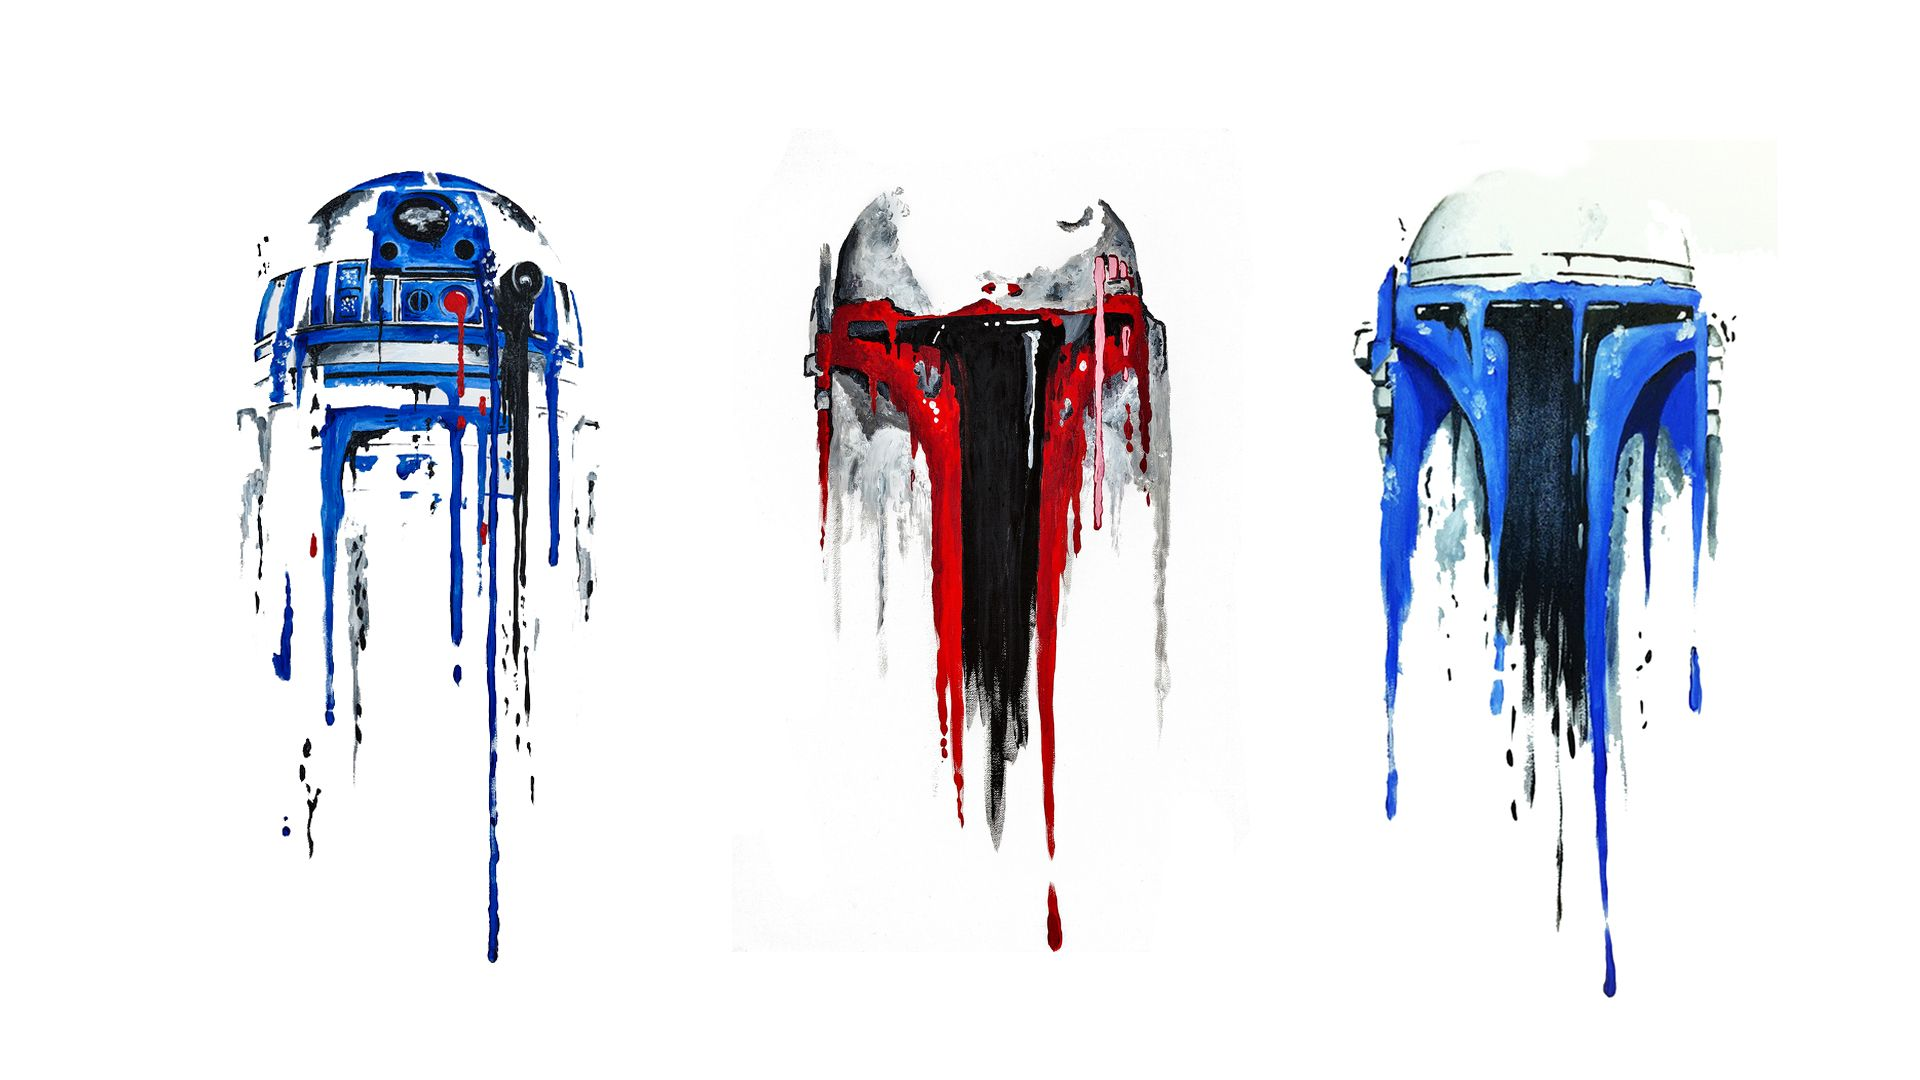 Amazing R2D2 Wallpaper